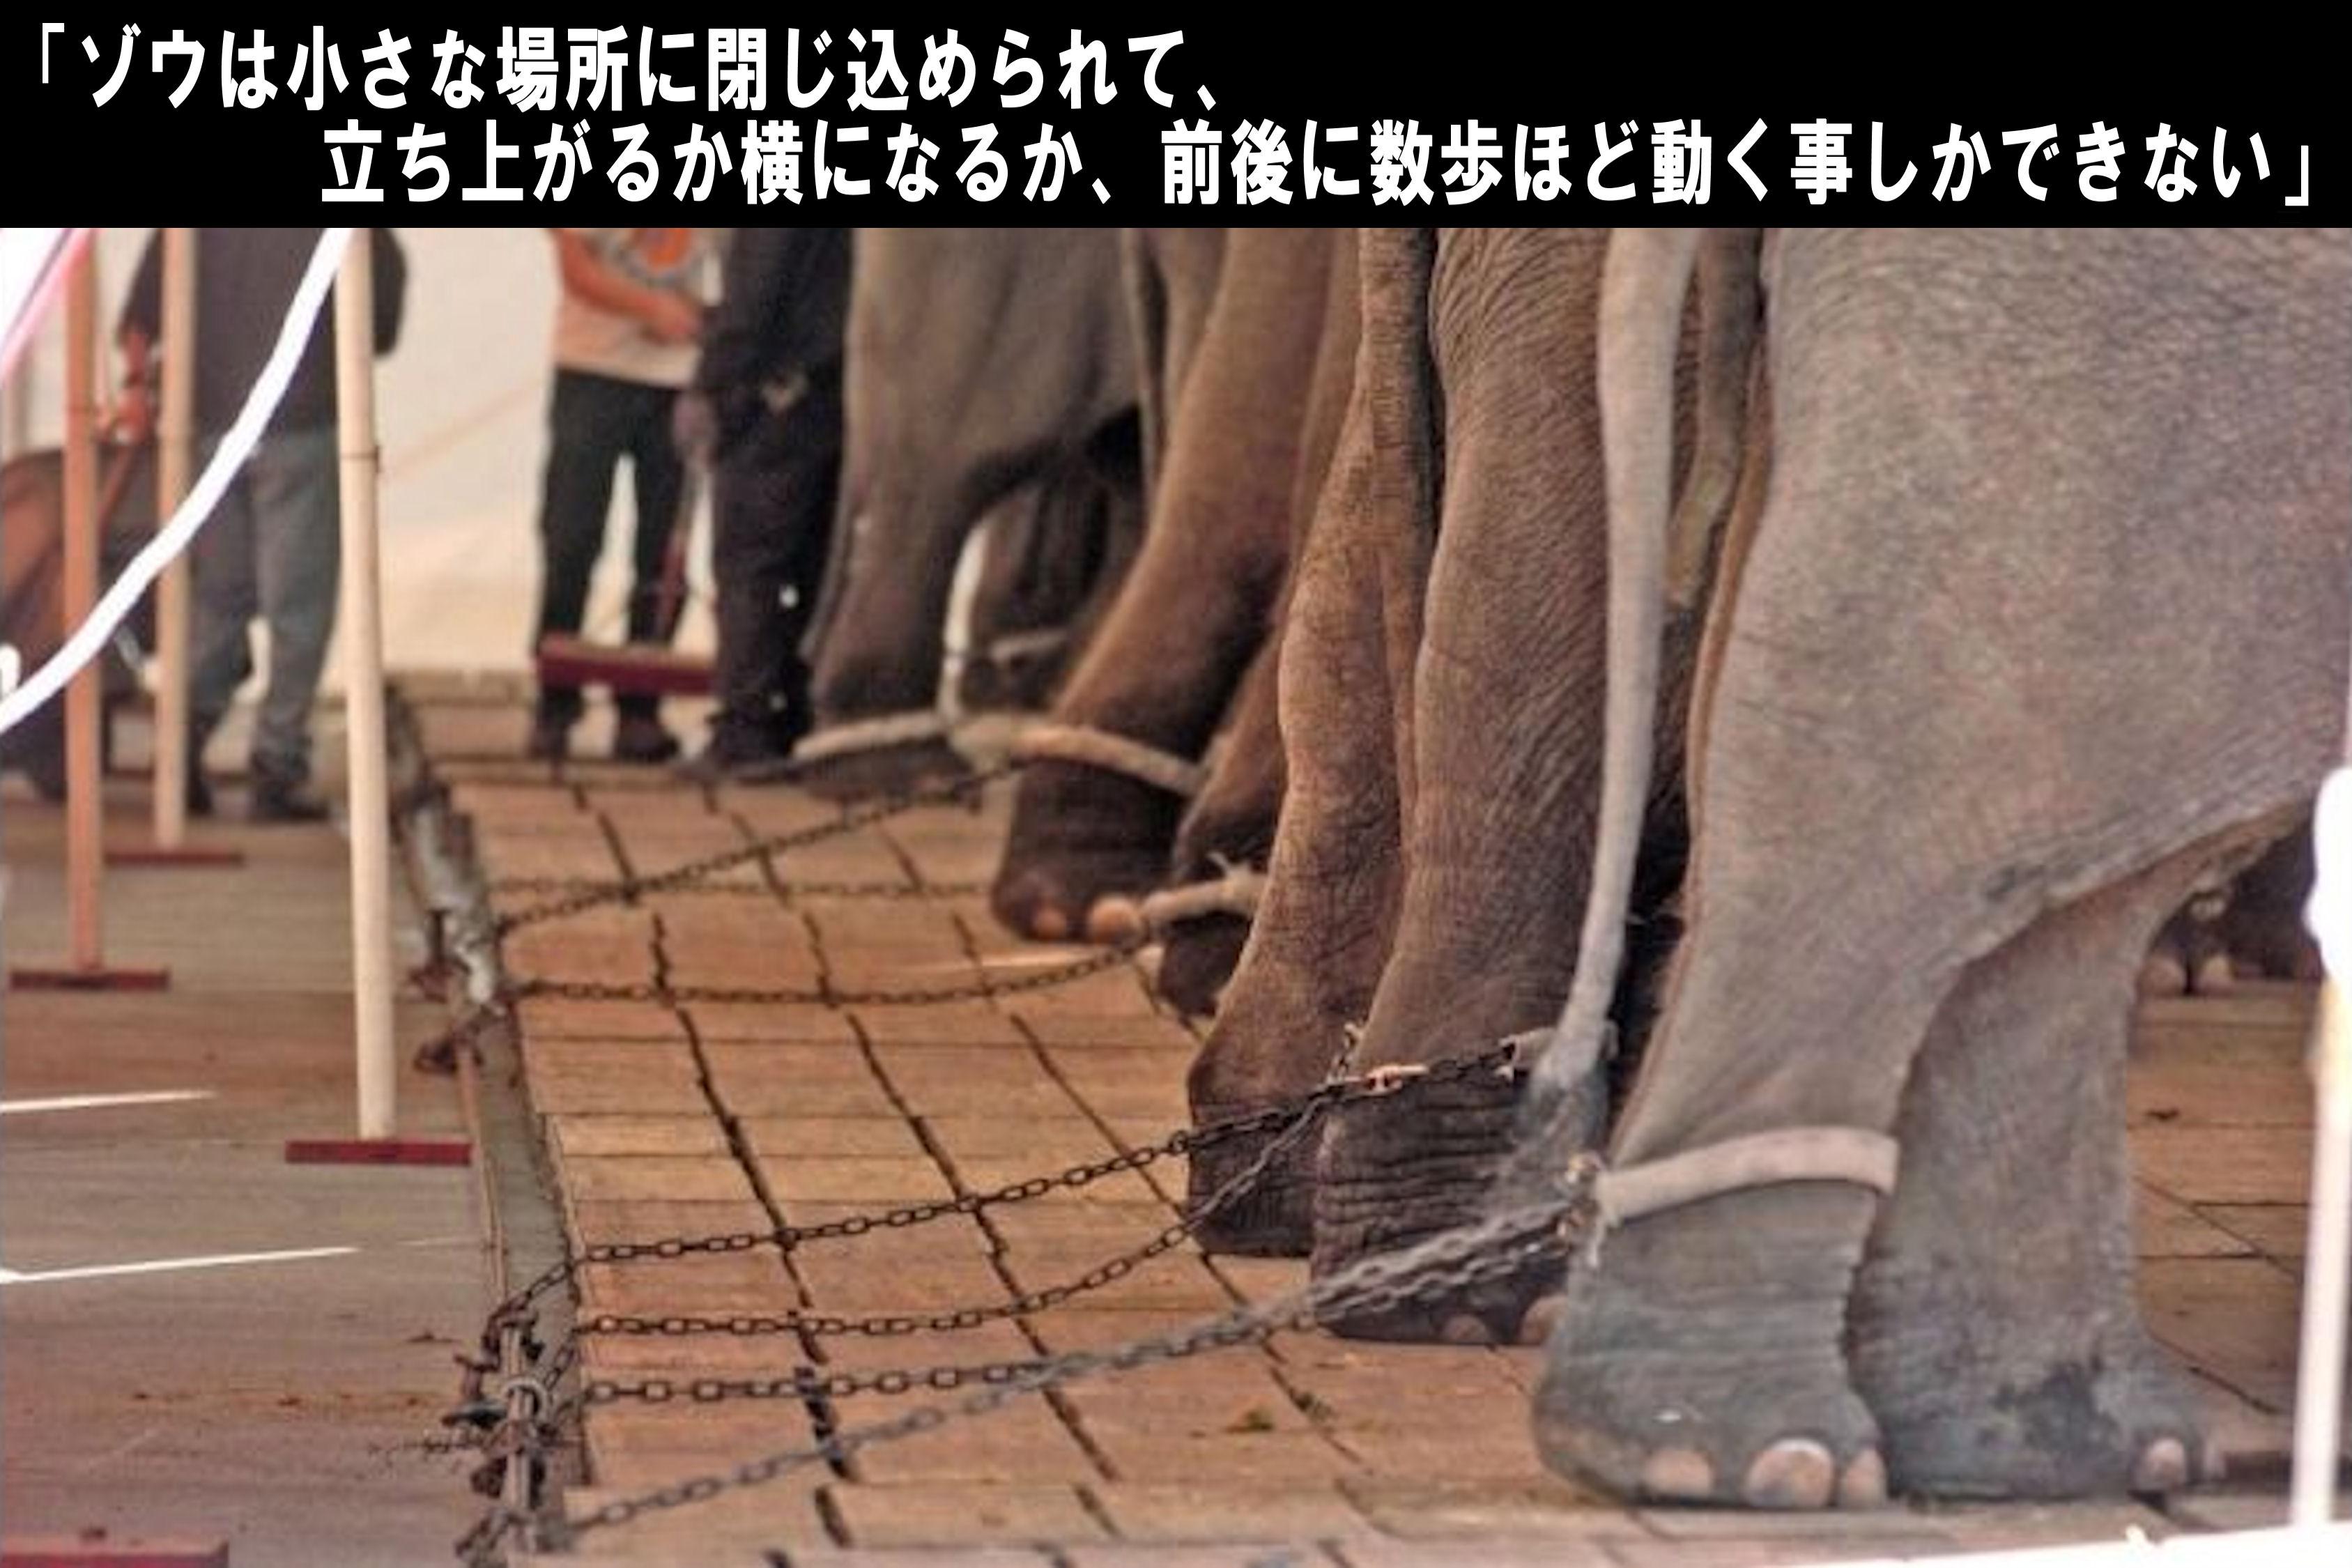 circusdemo3.jpg